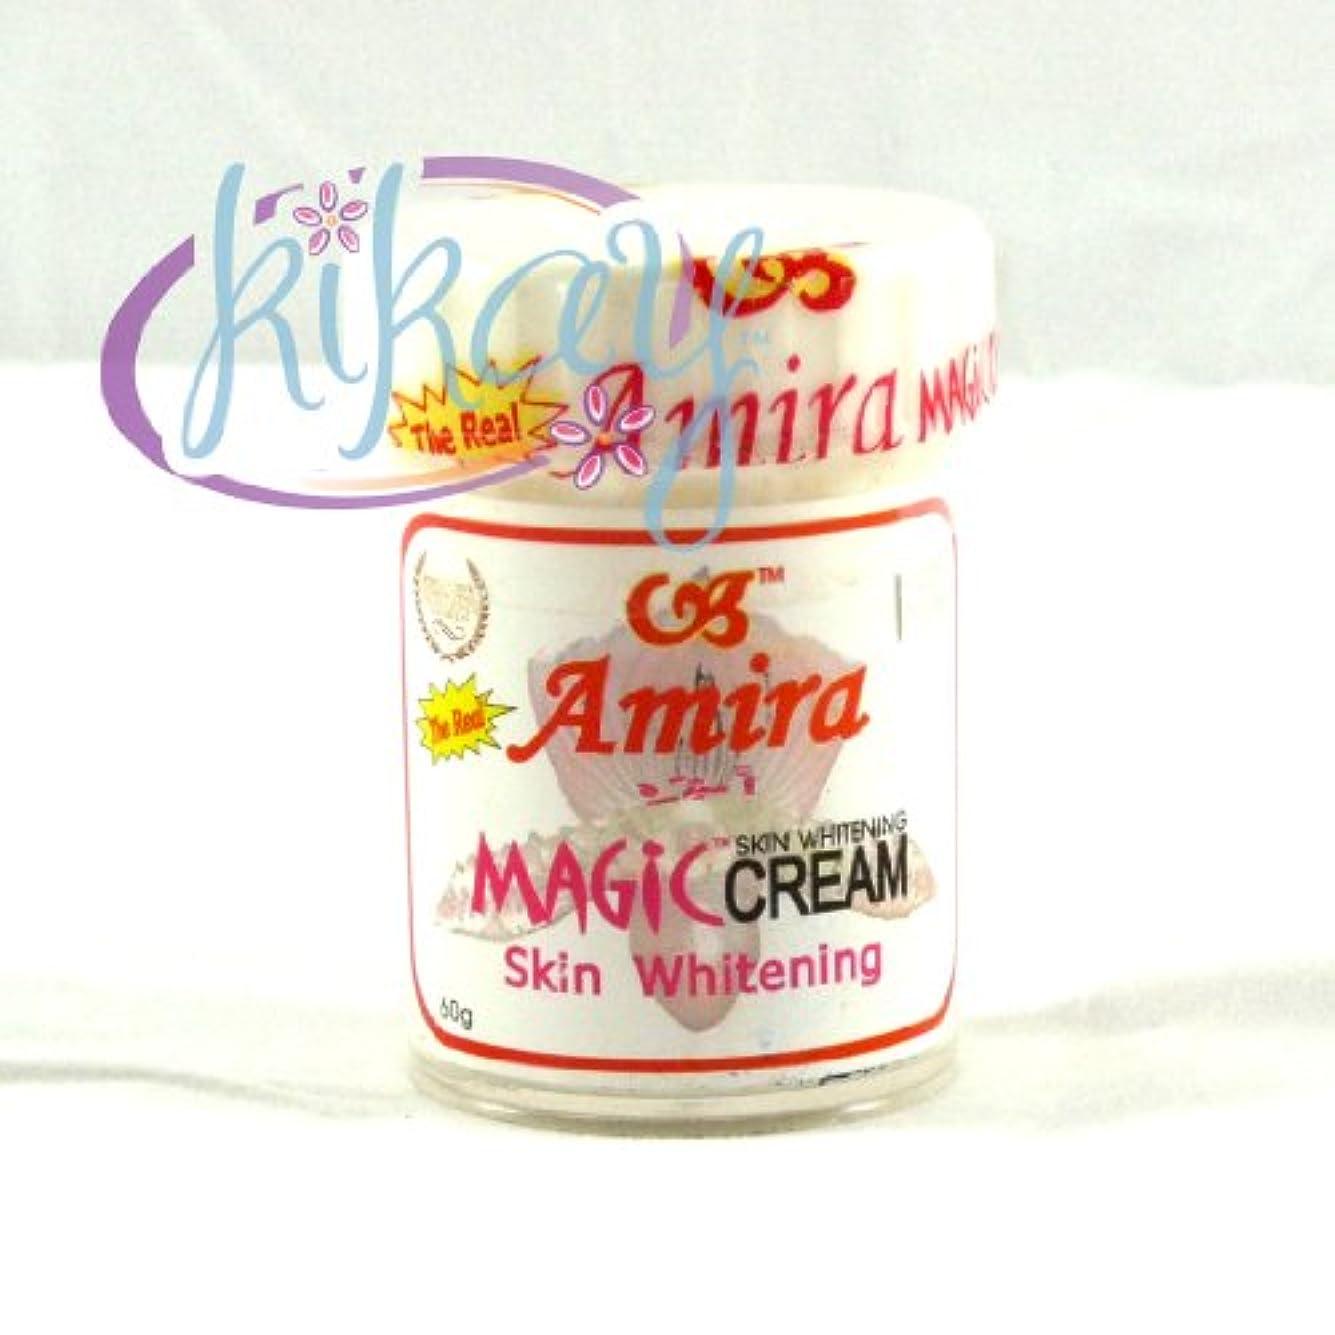 AMIRA THE REAL MAGIC CREAM【SKIN WHITENING CREAM 60g】PHILIPPINES〈スキン ホワイトニング クリーム〉フィリピン